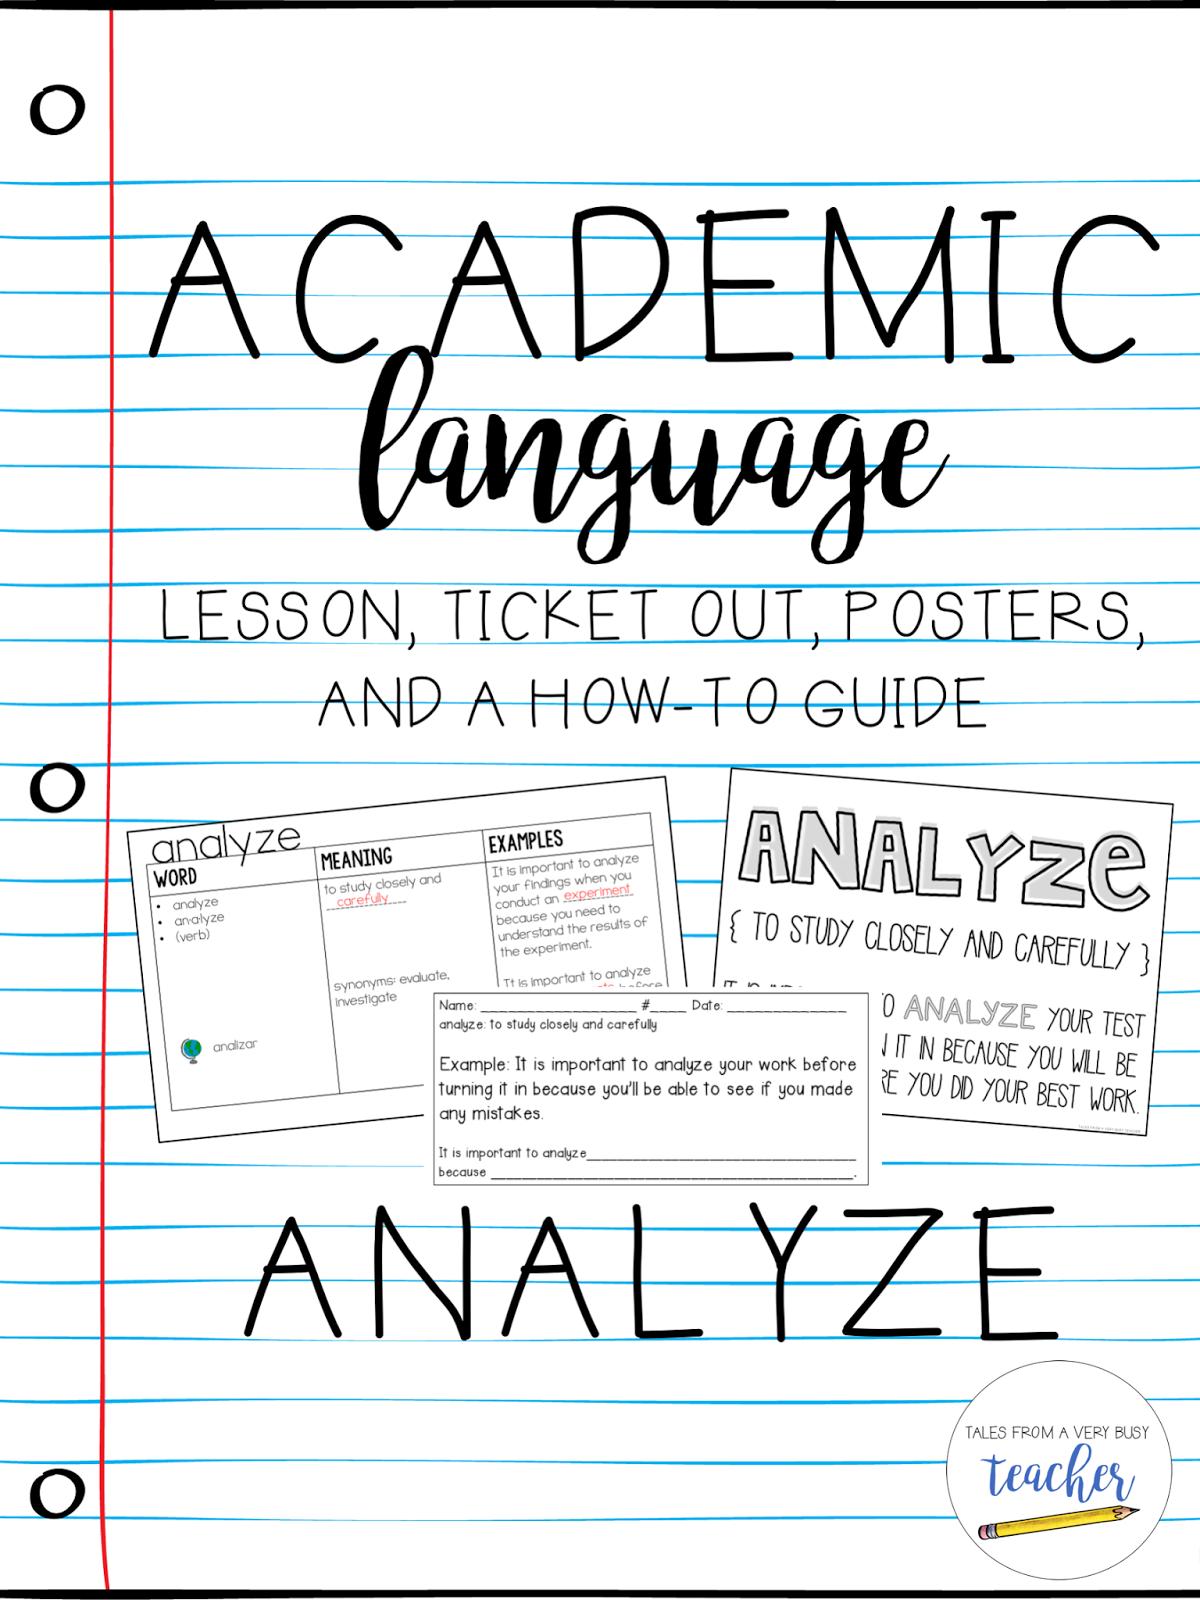 5 Tips For Teaching Academic Language